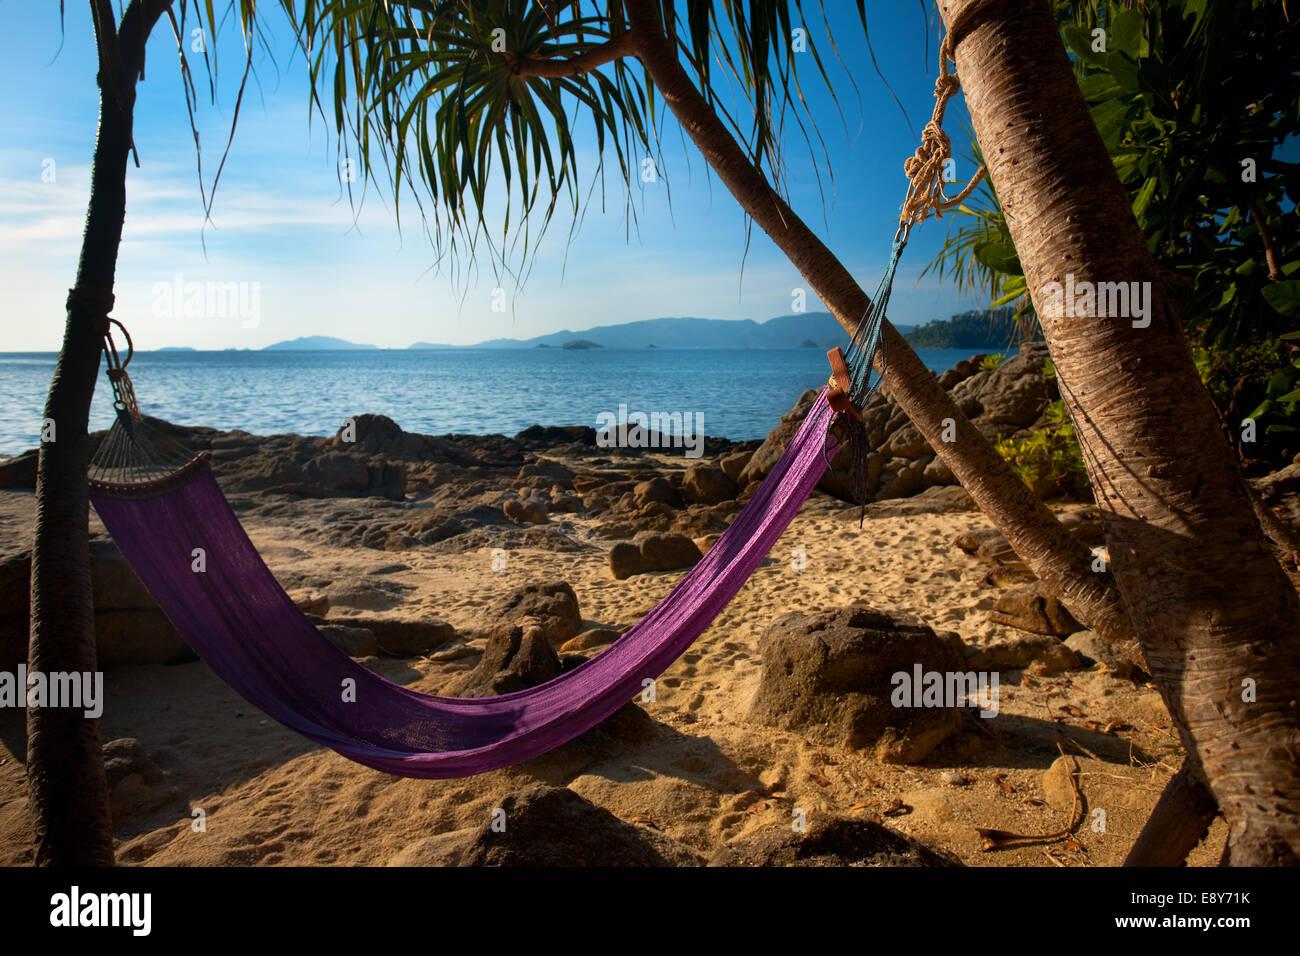 Hammock Secluded Jungle Beach - Stock Image